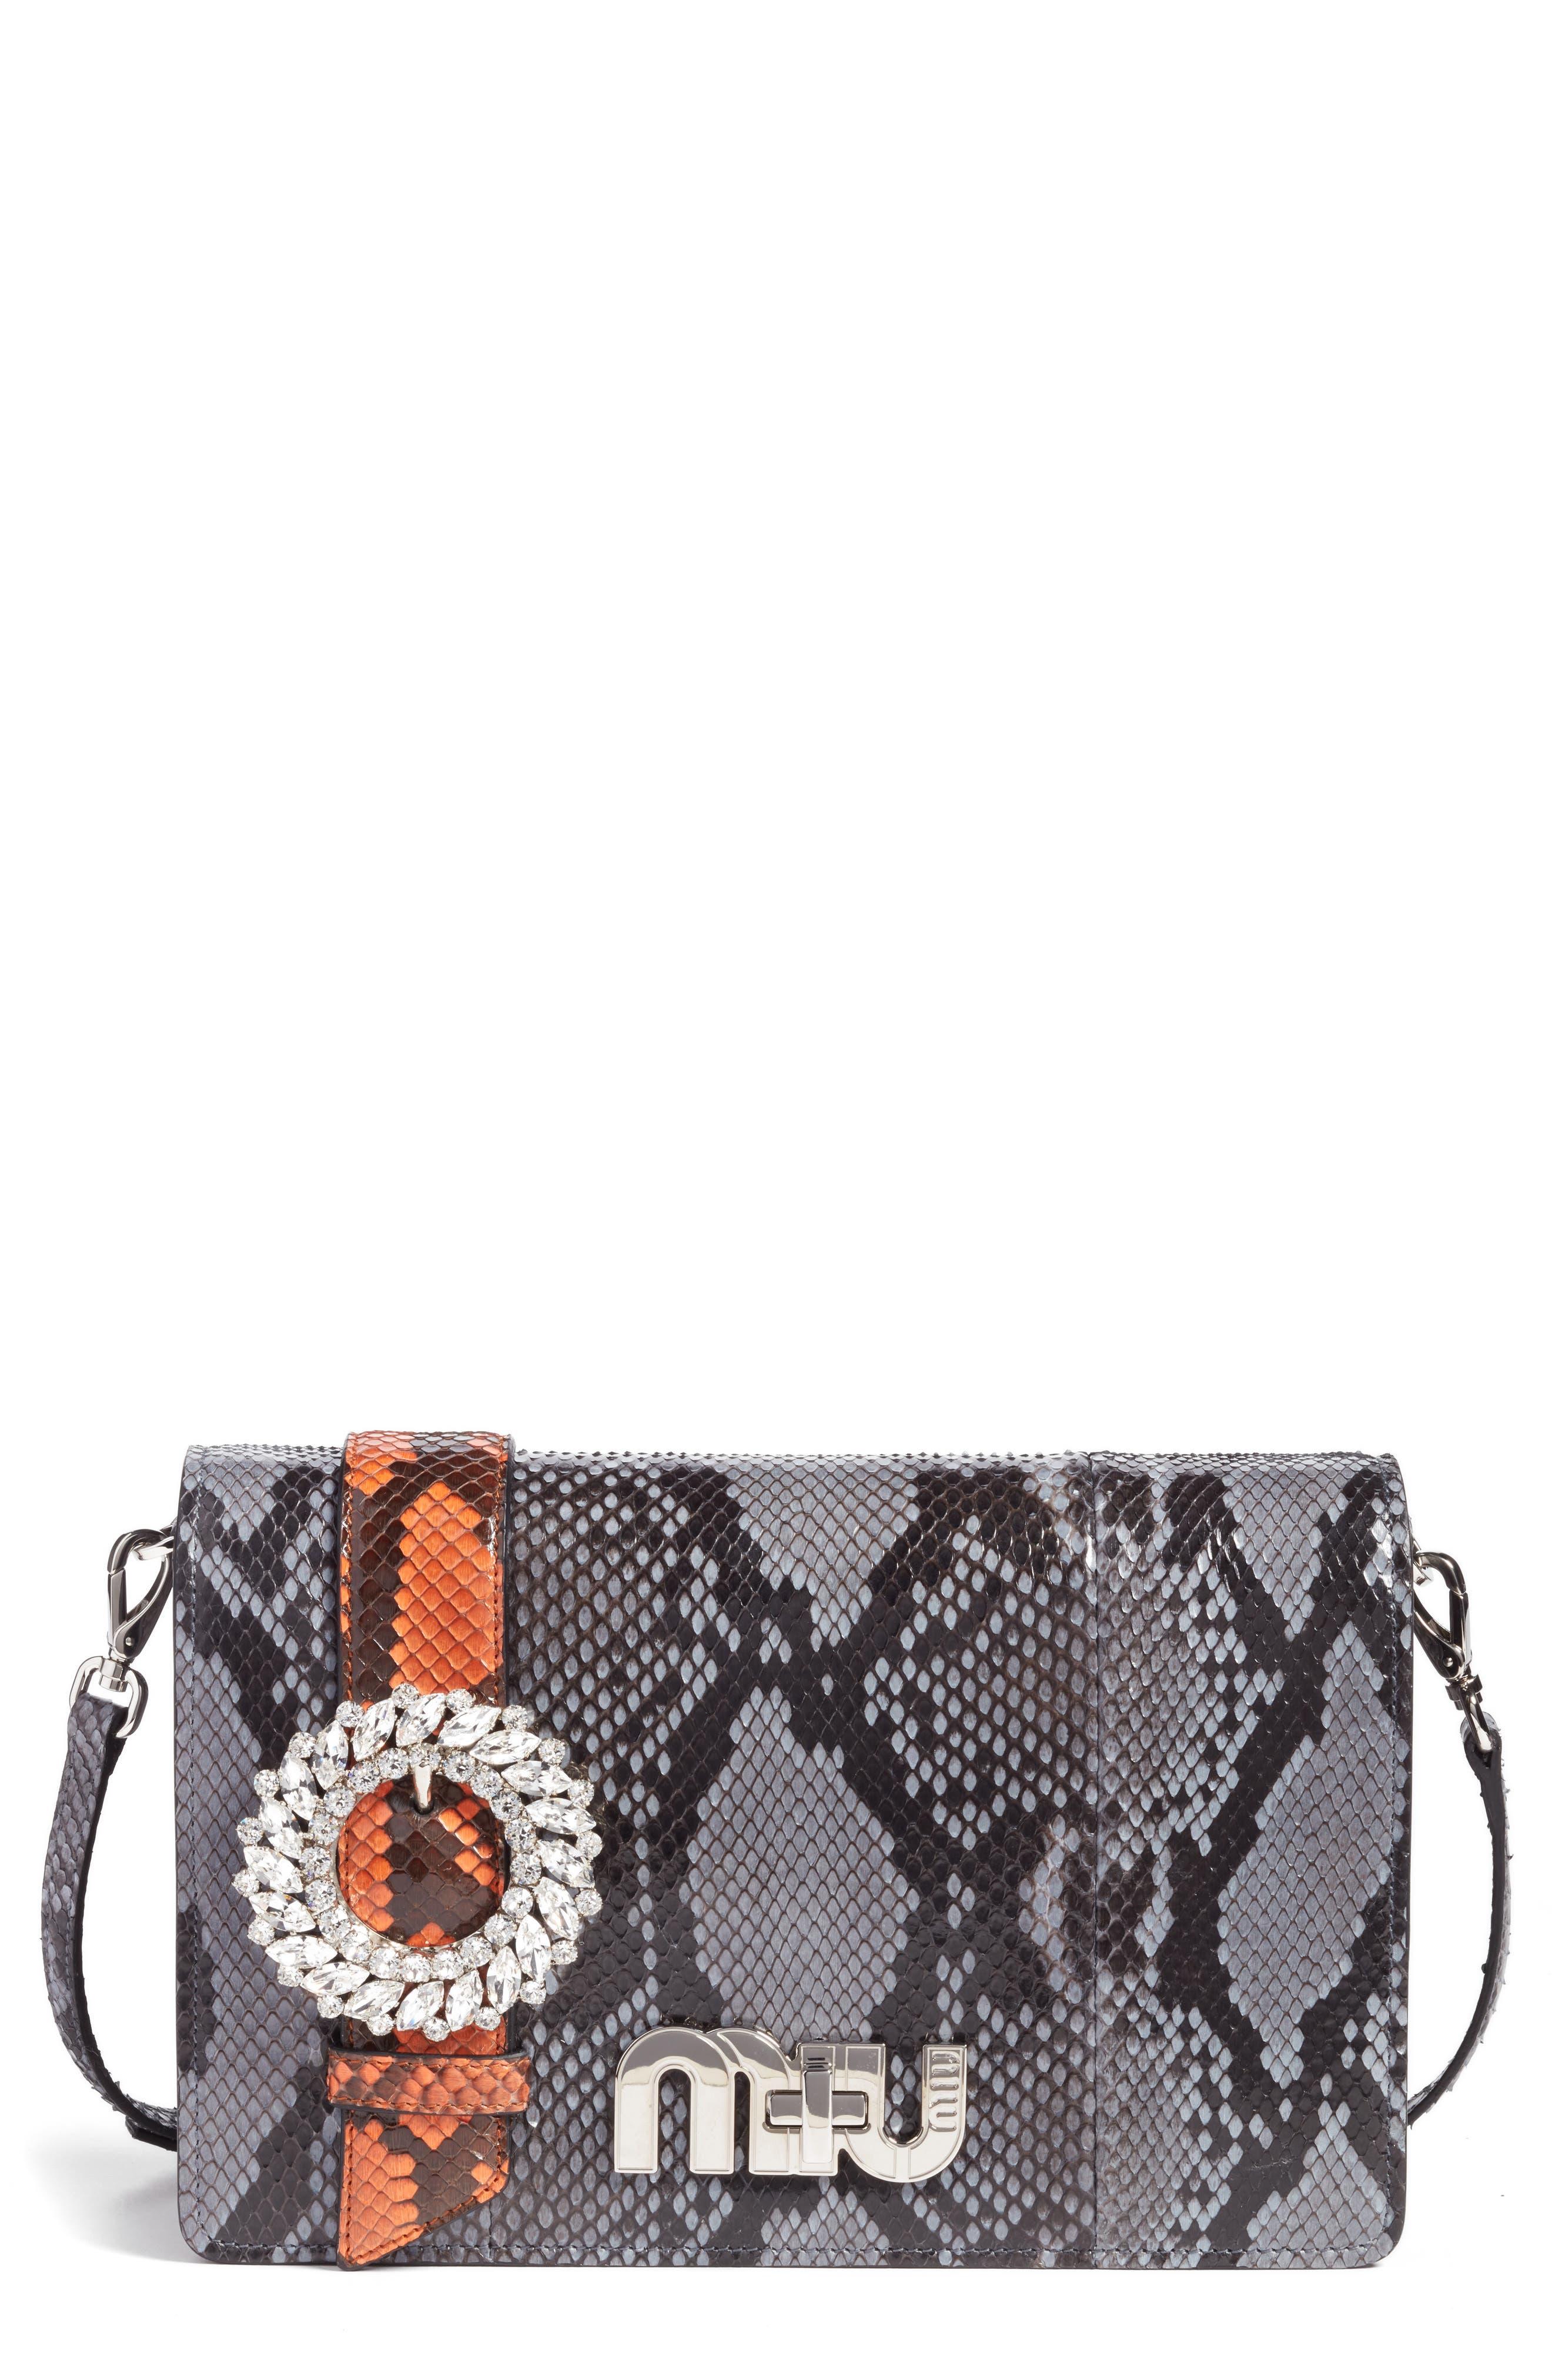 Alternate Image 1 Selected - Miu Miu Genuine Python Shoulder Bag